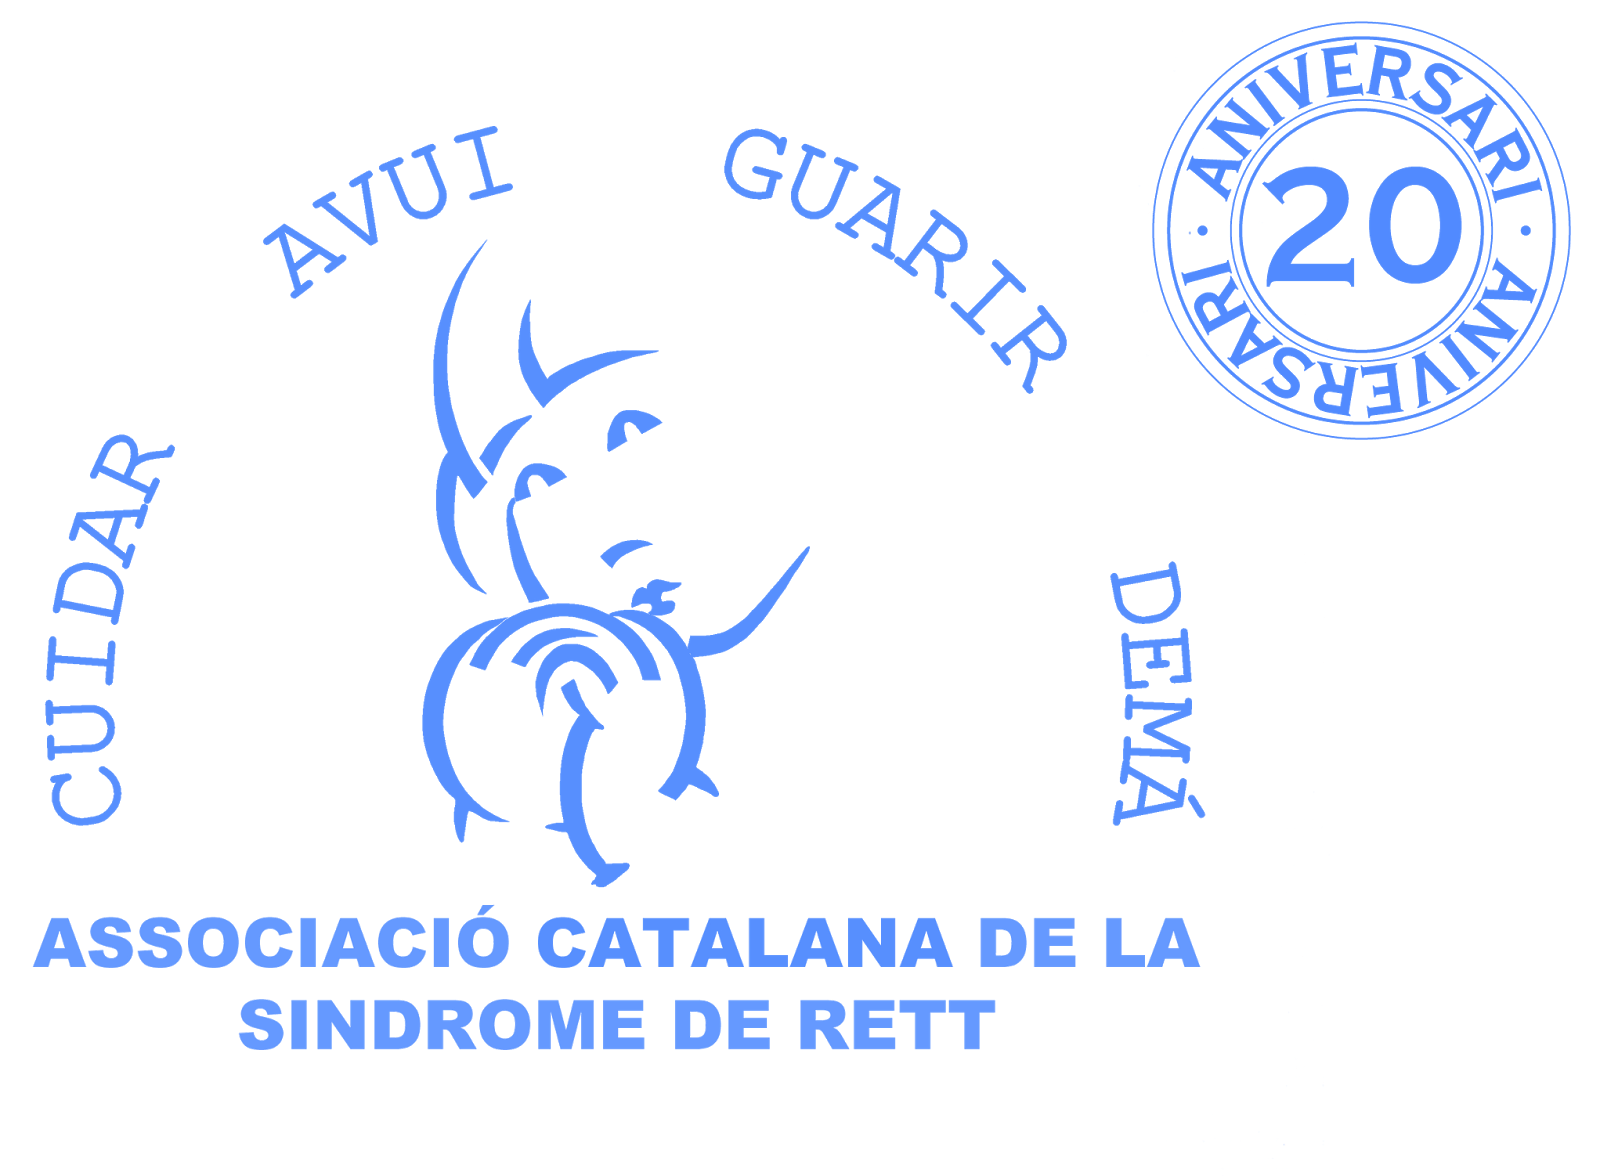 ASOCIACION CATALANA DE SINDROME DE RETT